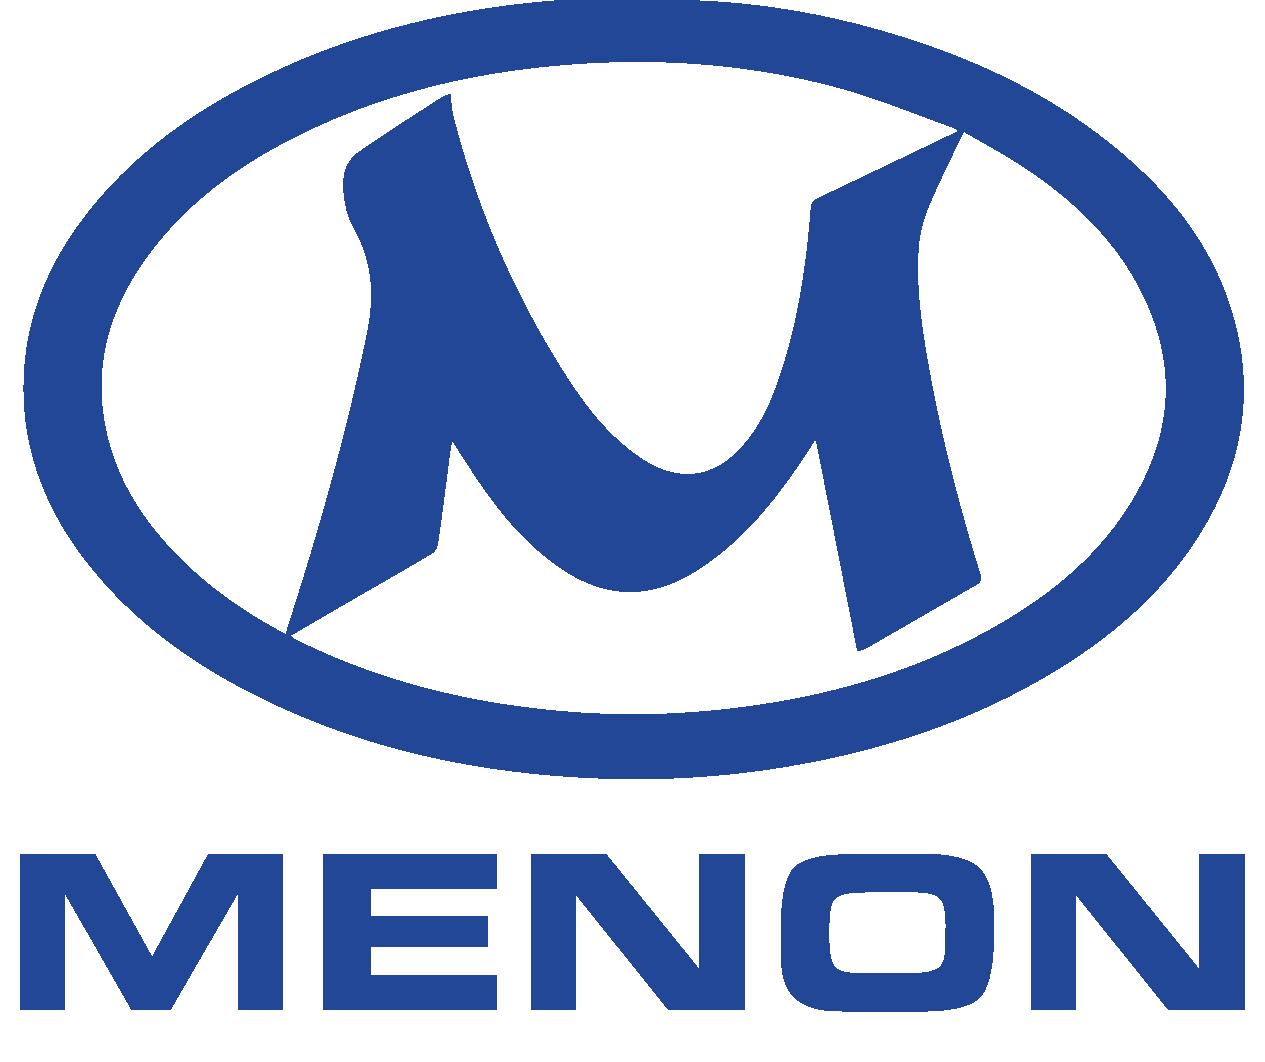 Menon logo blue